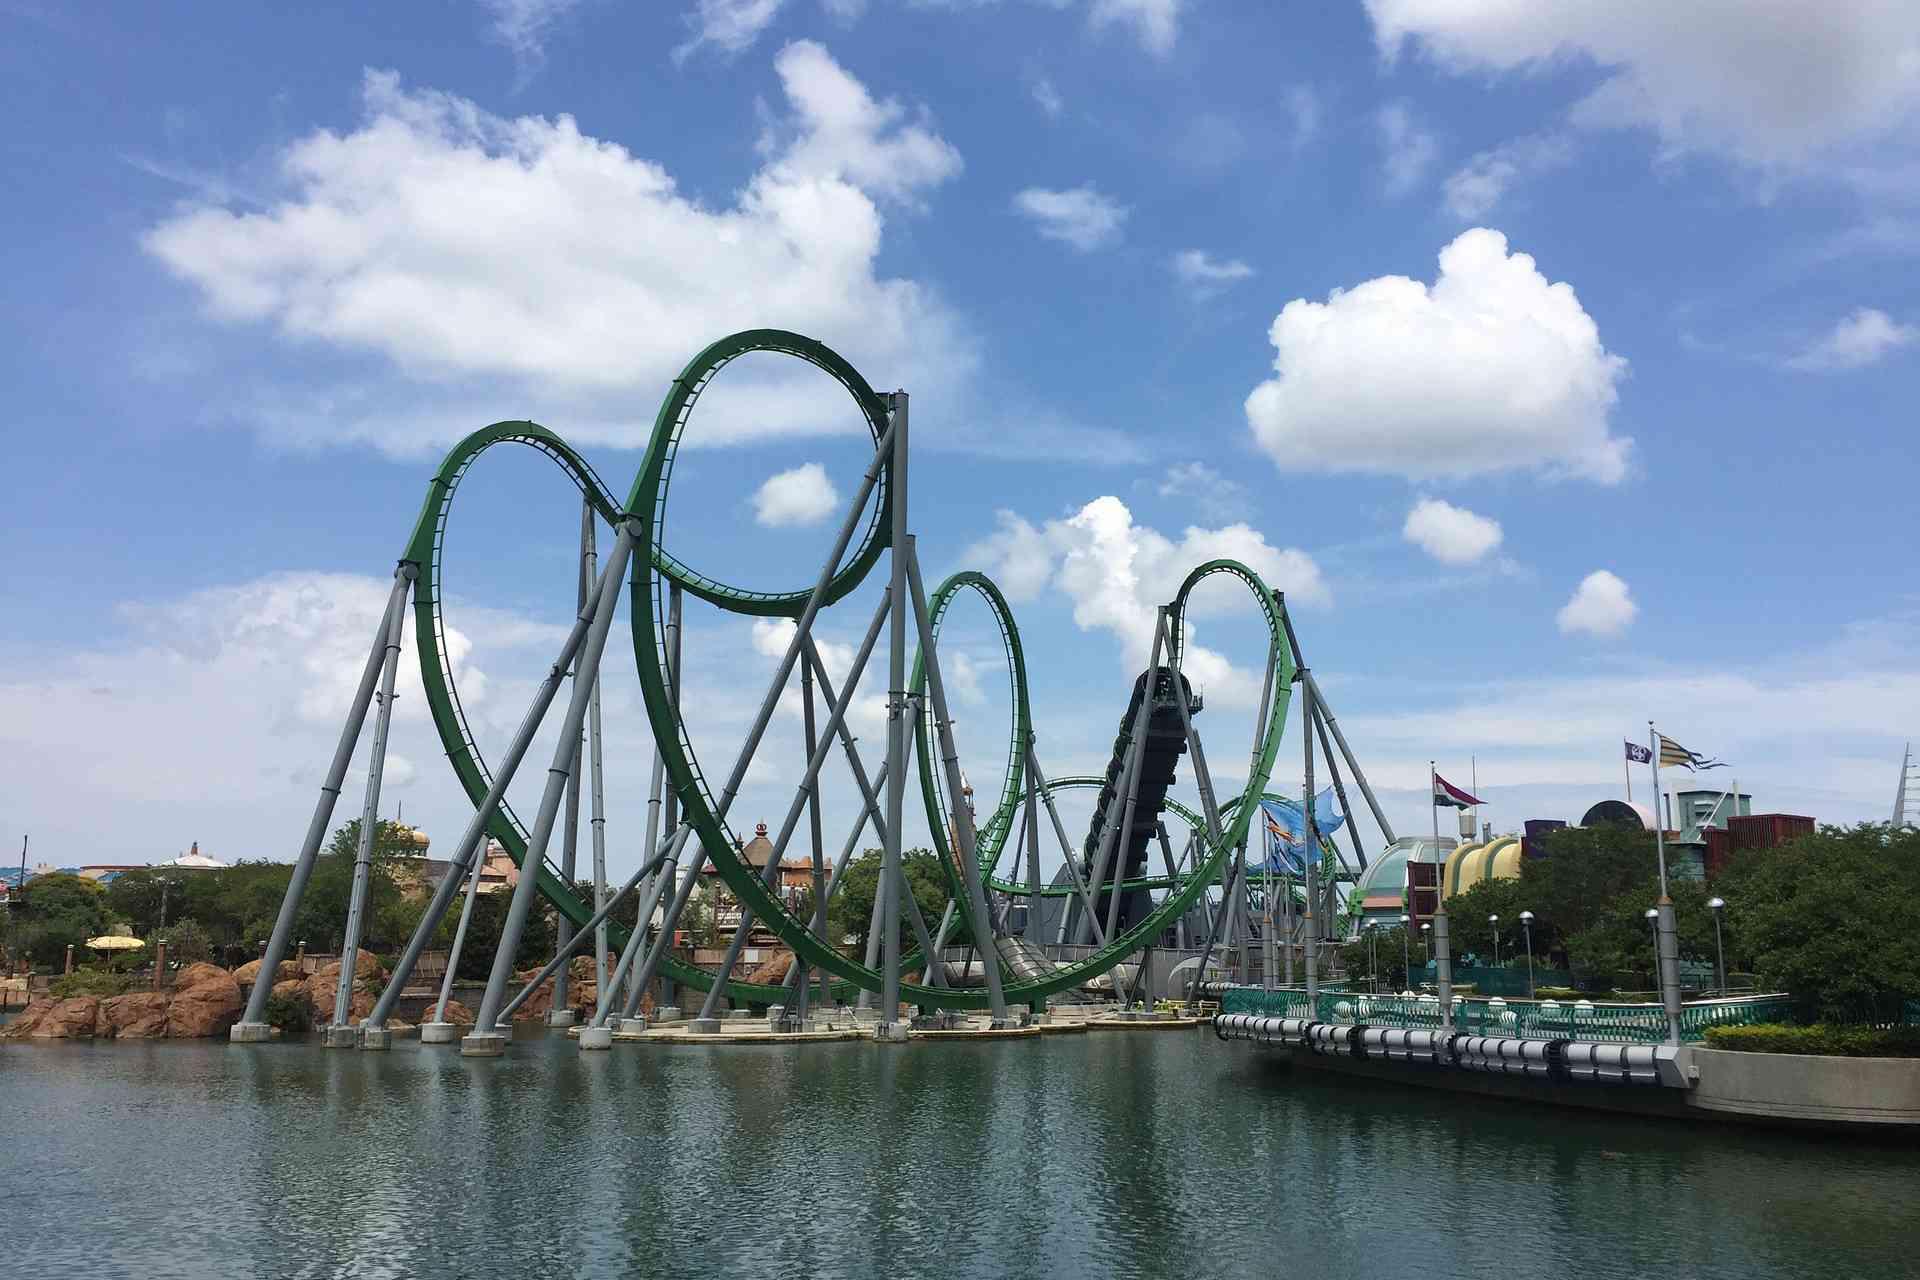 The Hulk Universal Orlando